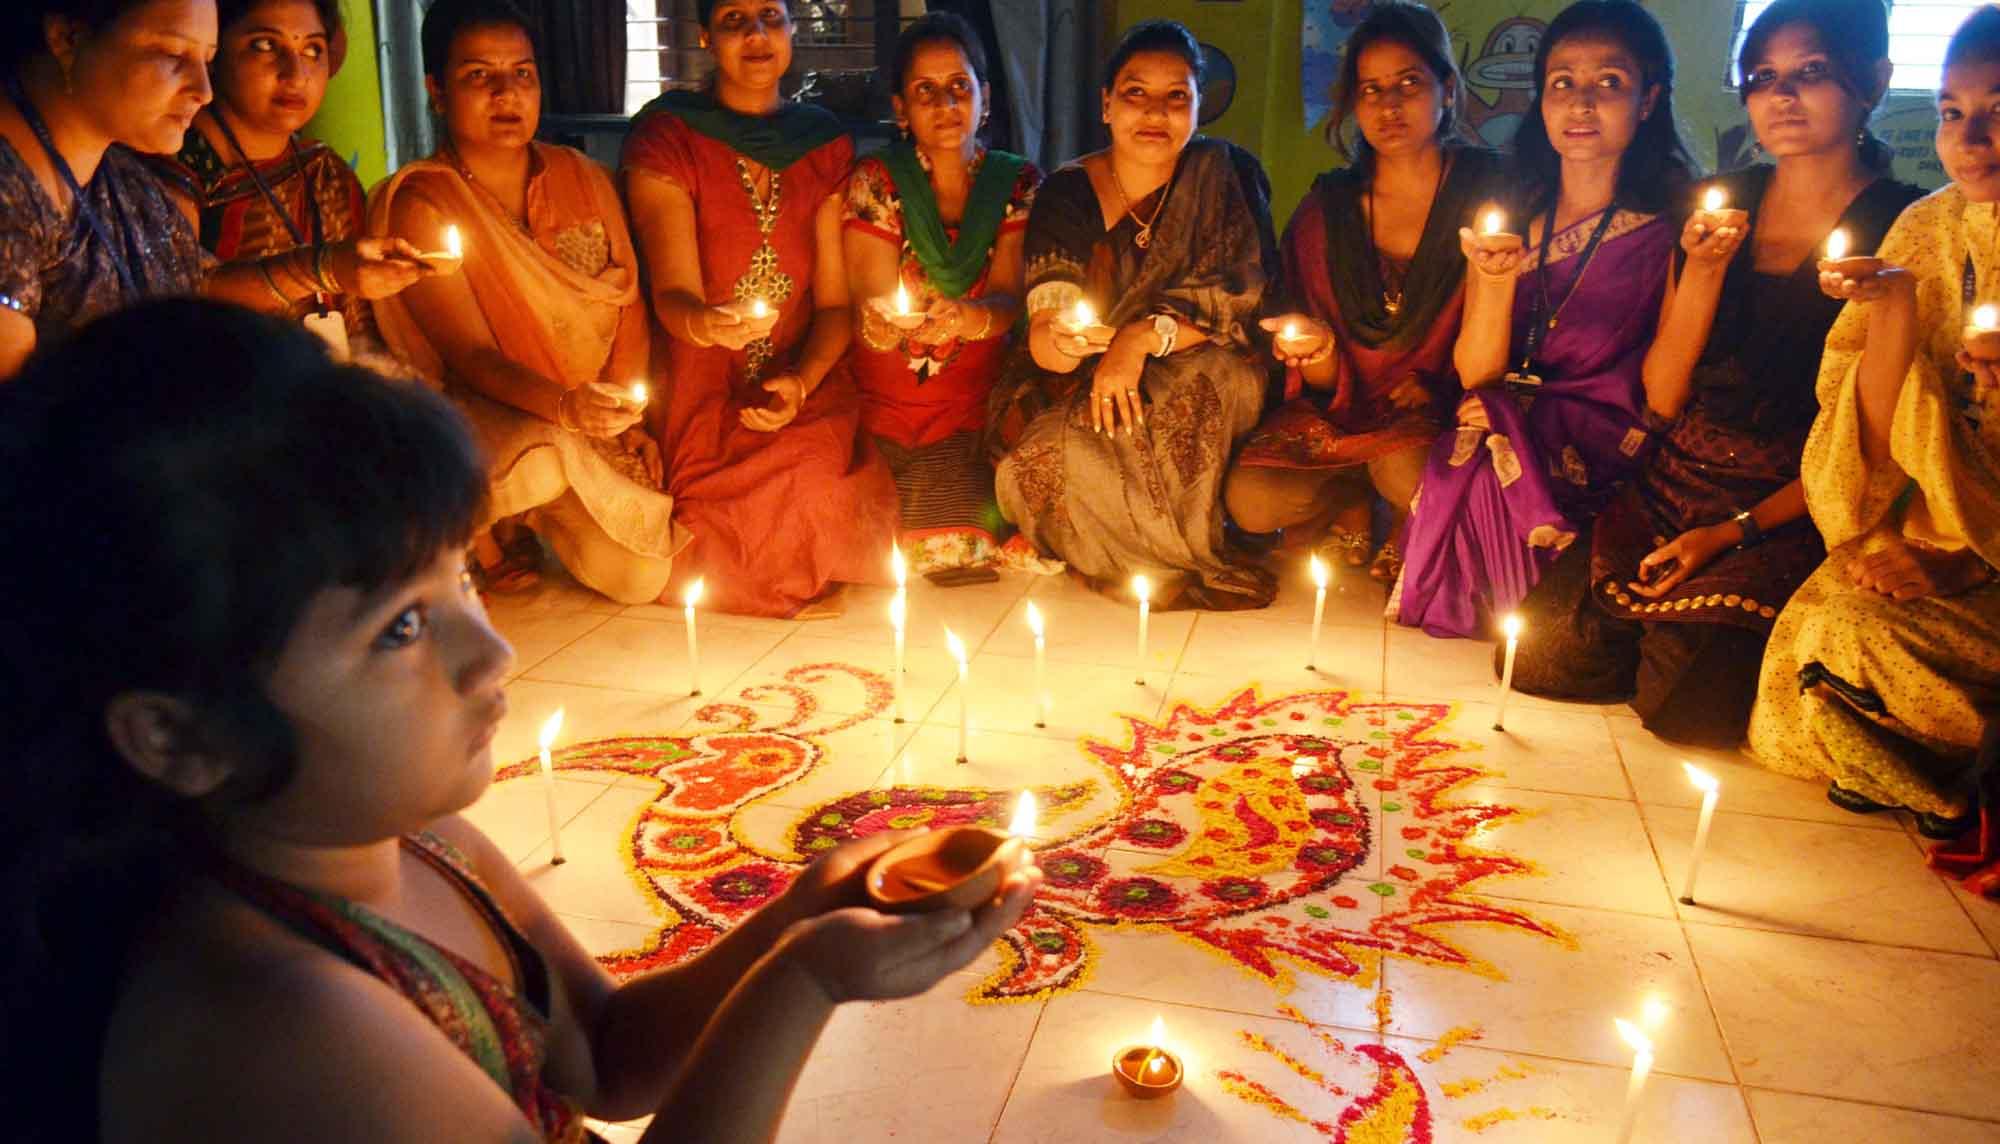 Top 10 Most Popular Hindu Festivals Celebrated in India